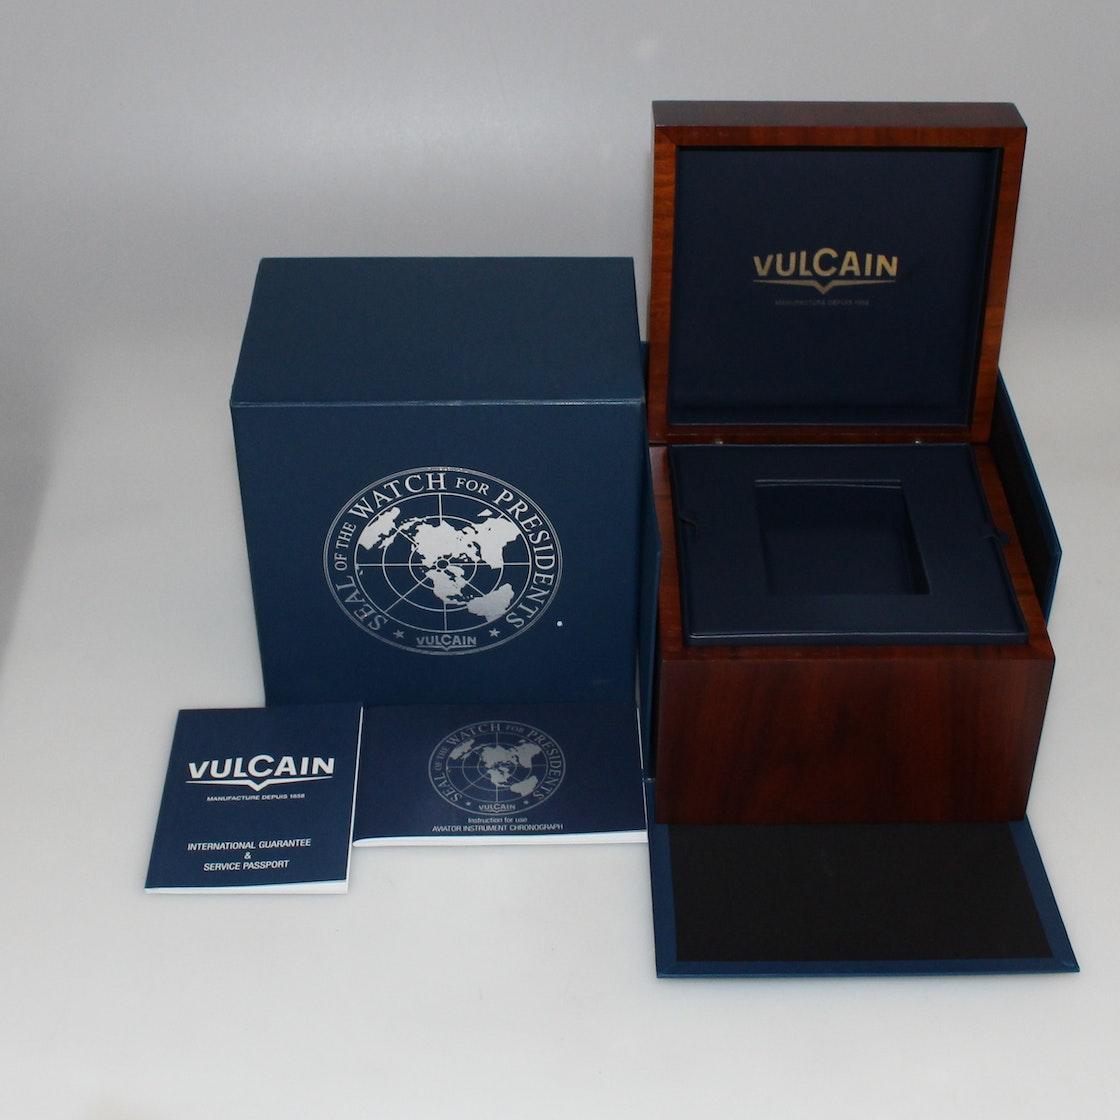 Vulcain 50s Presidents' Watch 110651.287L